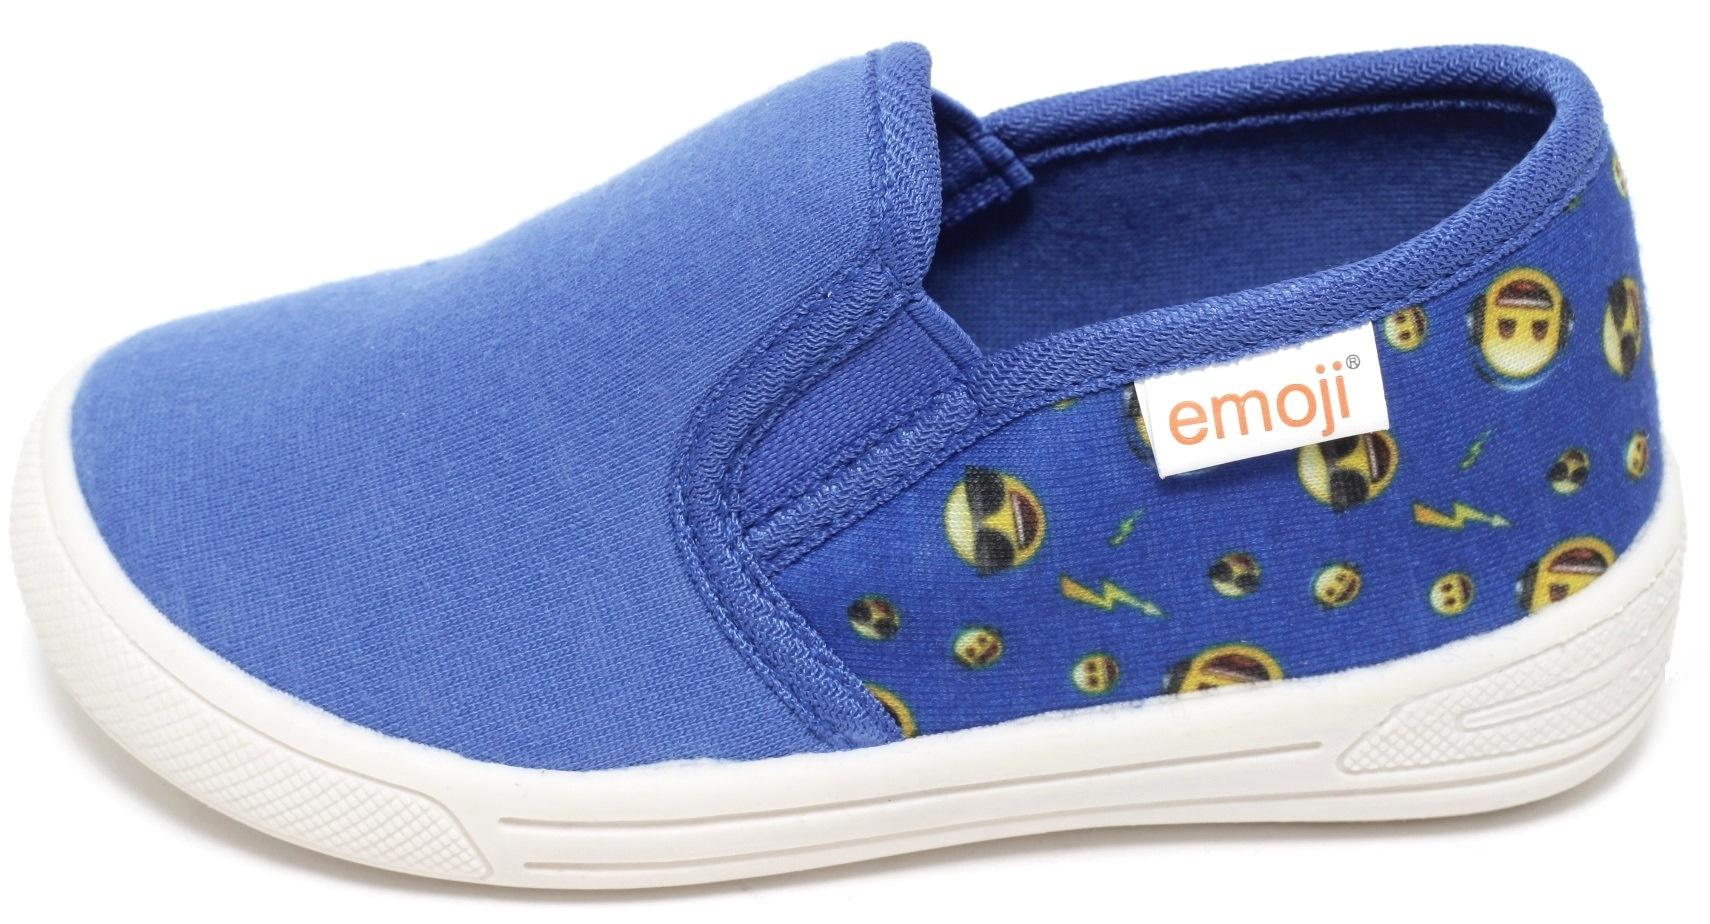 51cc782dbde287 Kinder Sneaker Slipper Unisex Freizeitschuhe Schuhe Halbschuhe emoji Smiley  blau